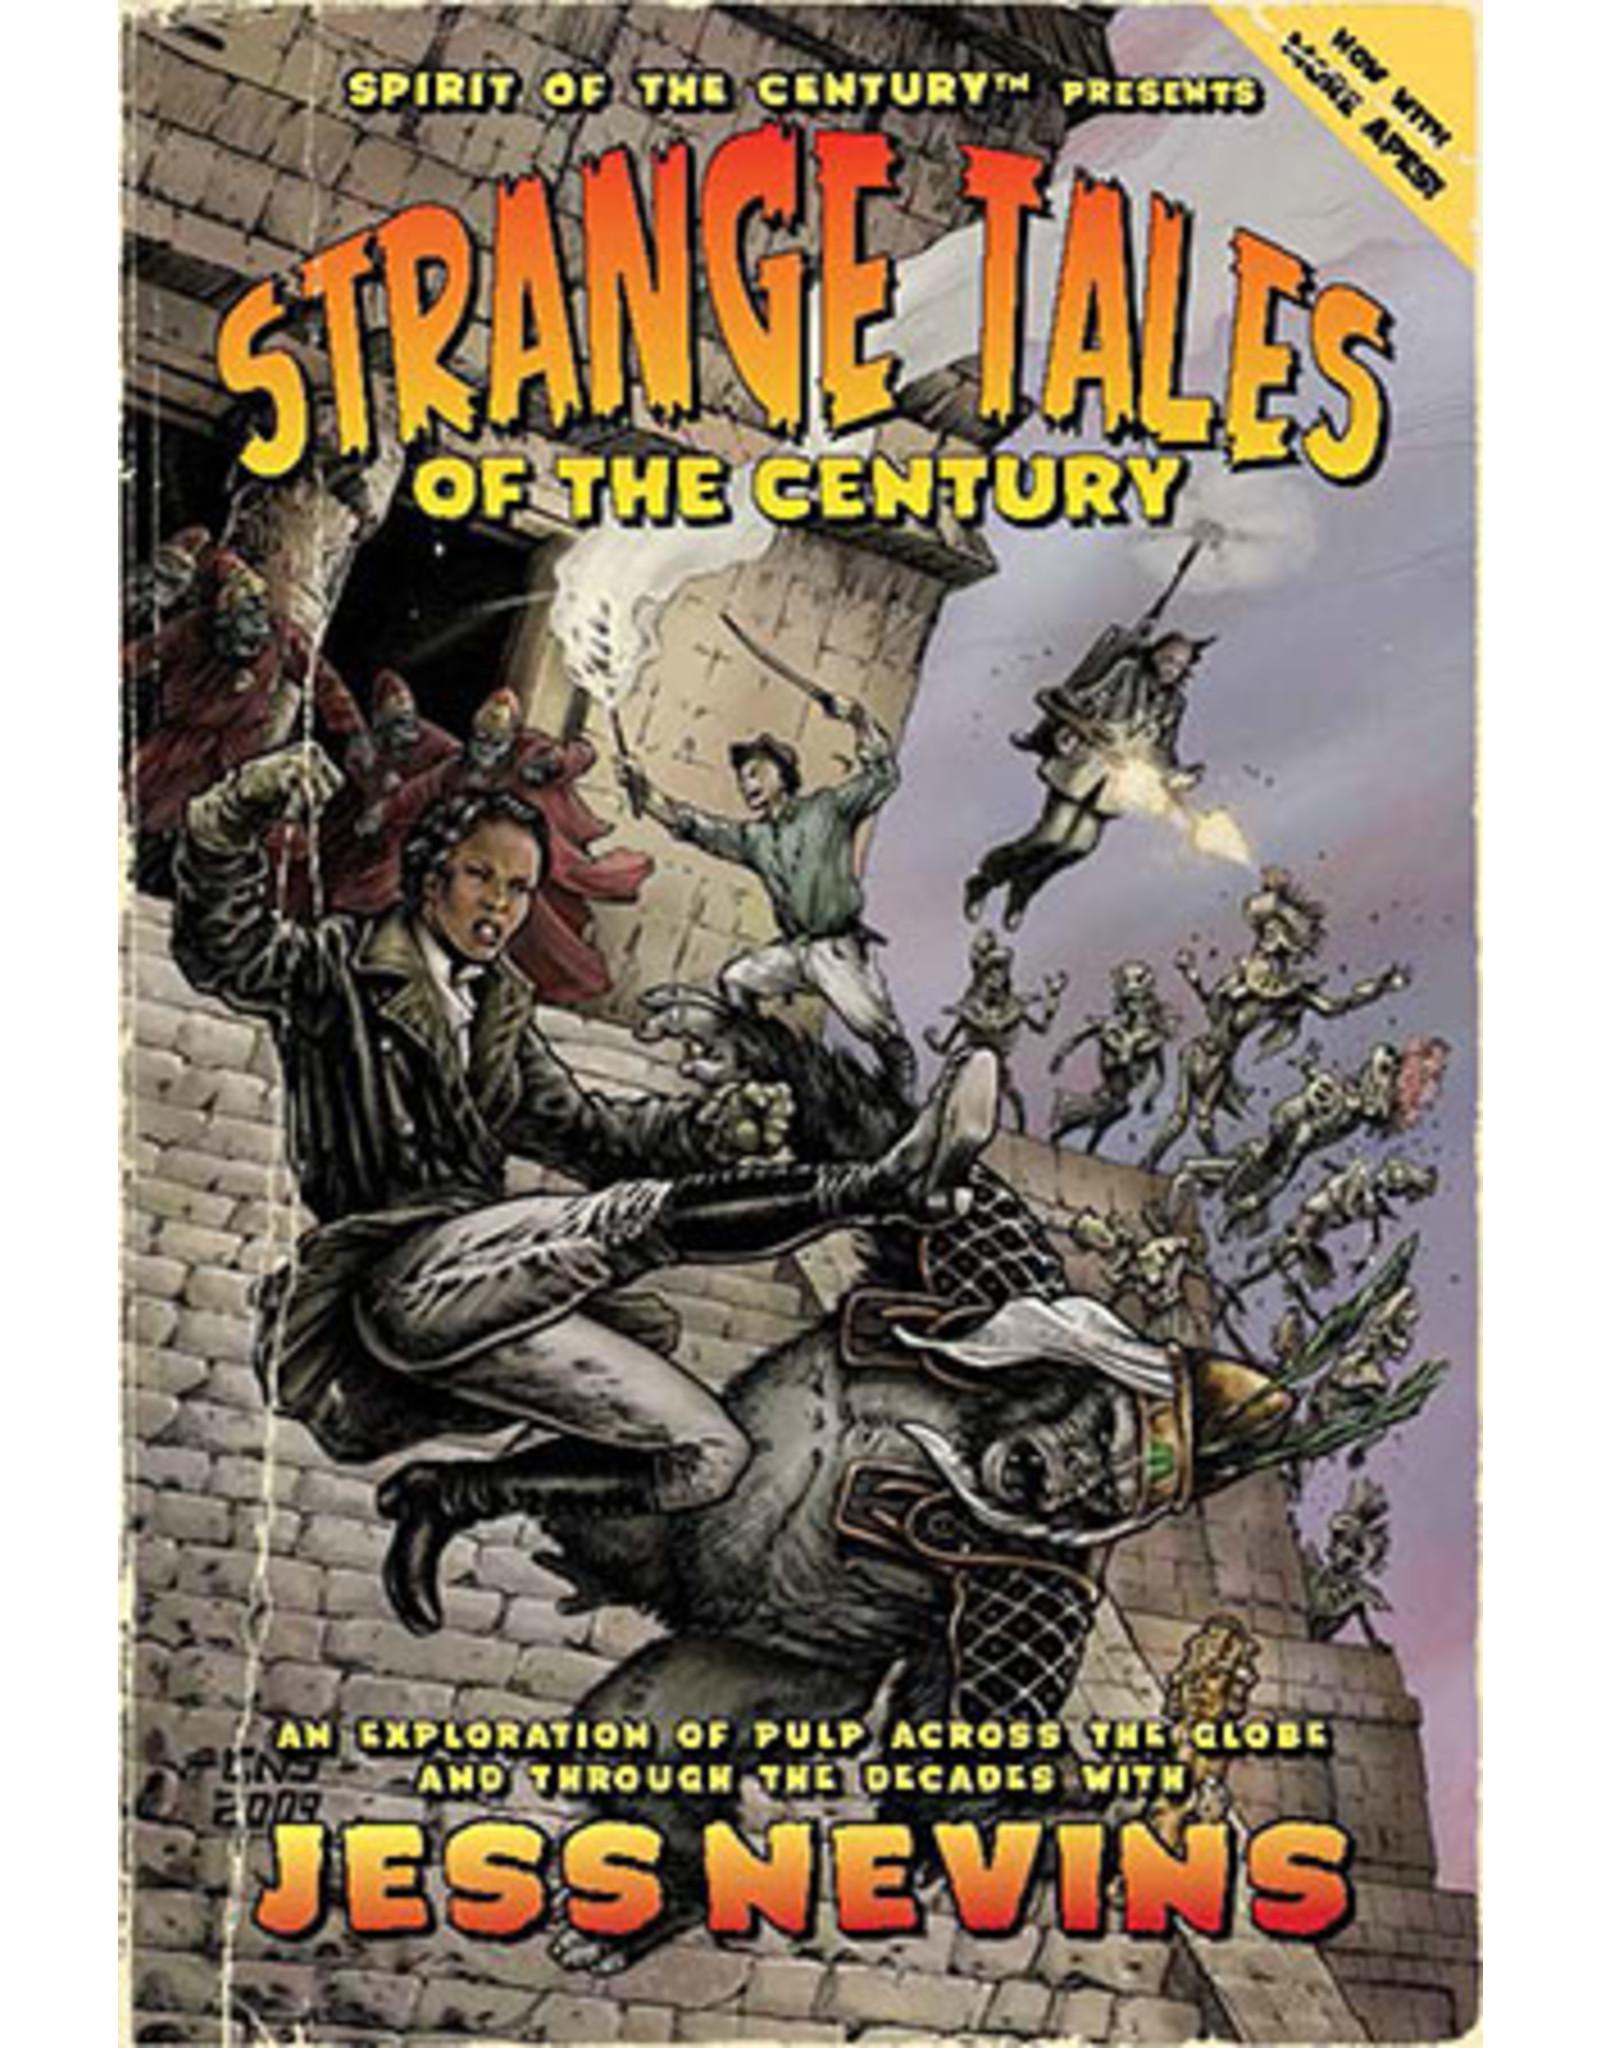 FATE RPG: Spirit of the Century - Strange Tales of the Century